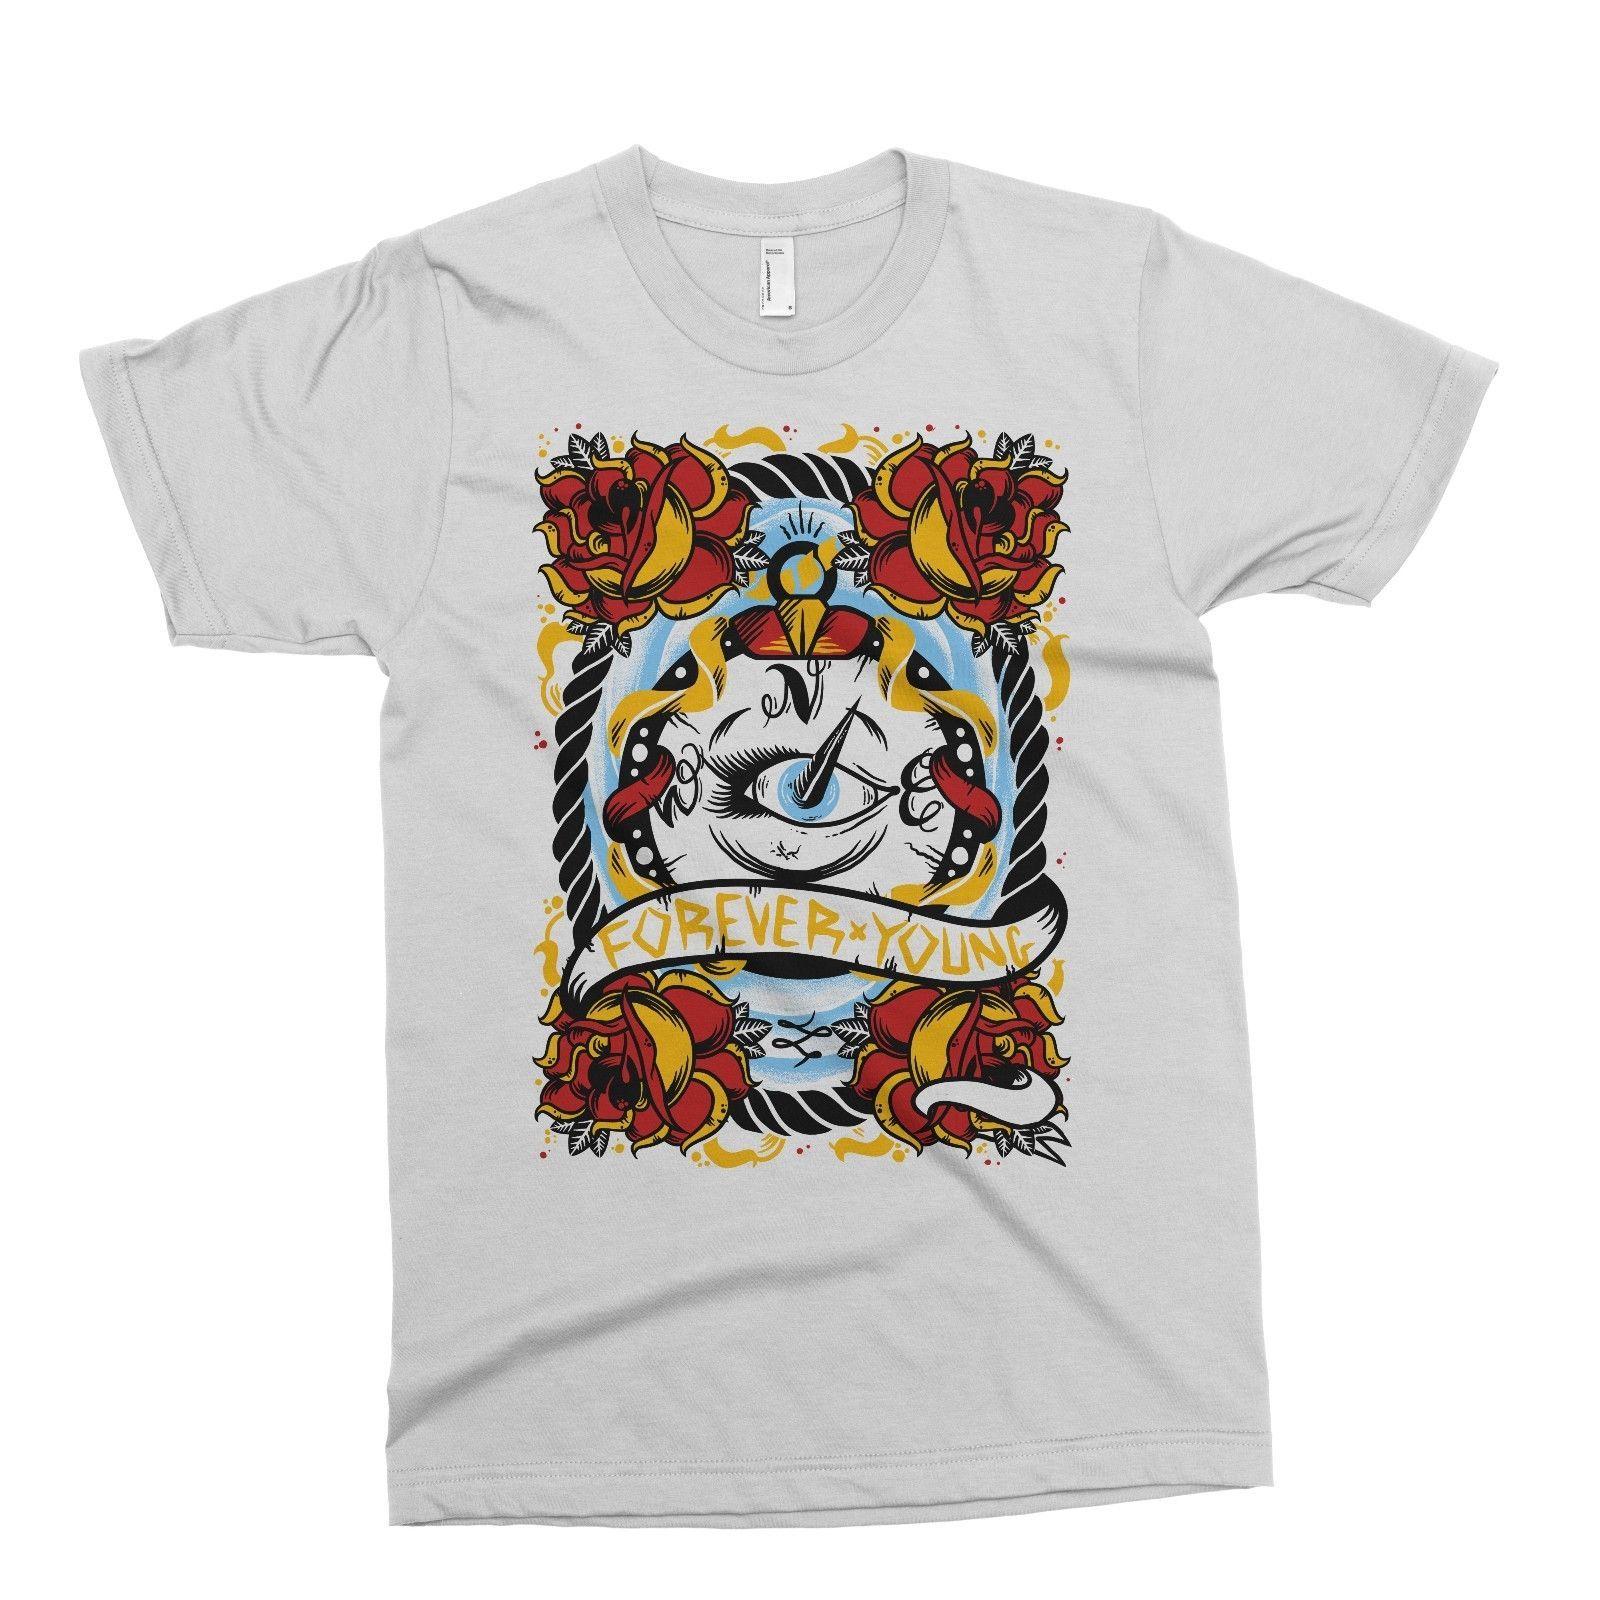 ba1f62de3e6b Tidal Wave T Shirt Tattoo PULP Foot Asylum Rebel Circus Drop Dead Ark Rebel  Yep High Quality Custom Printed Tops Hipster T Shirt Crazy T Shirt Design  Comedy ...